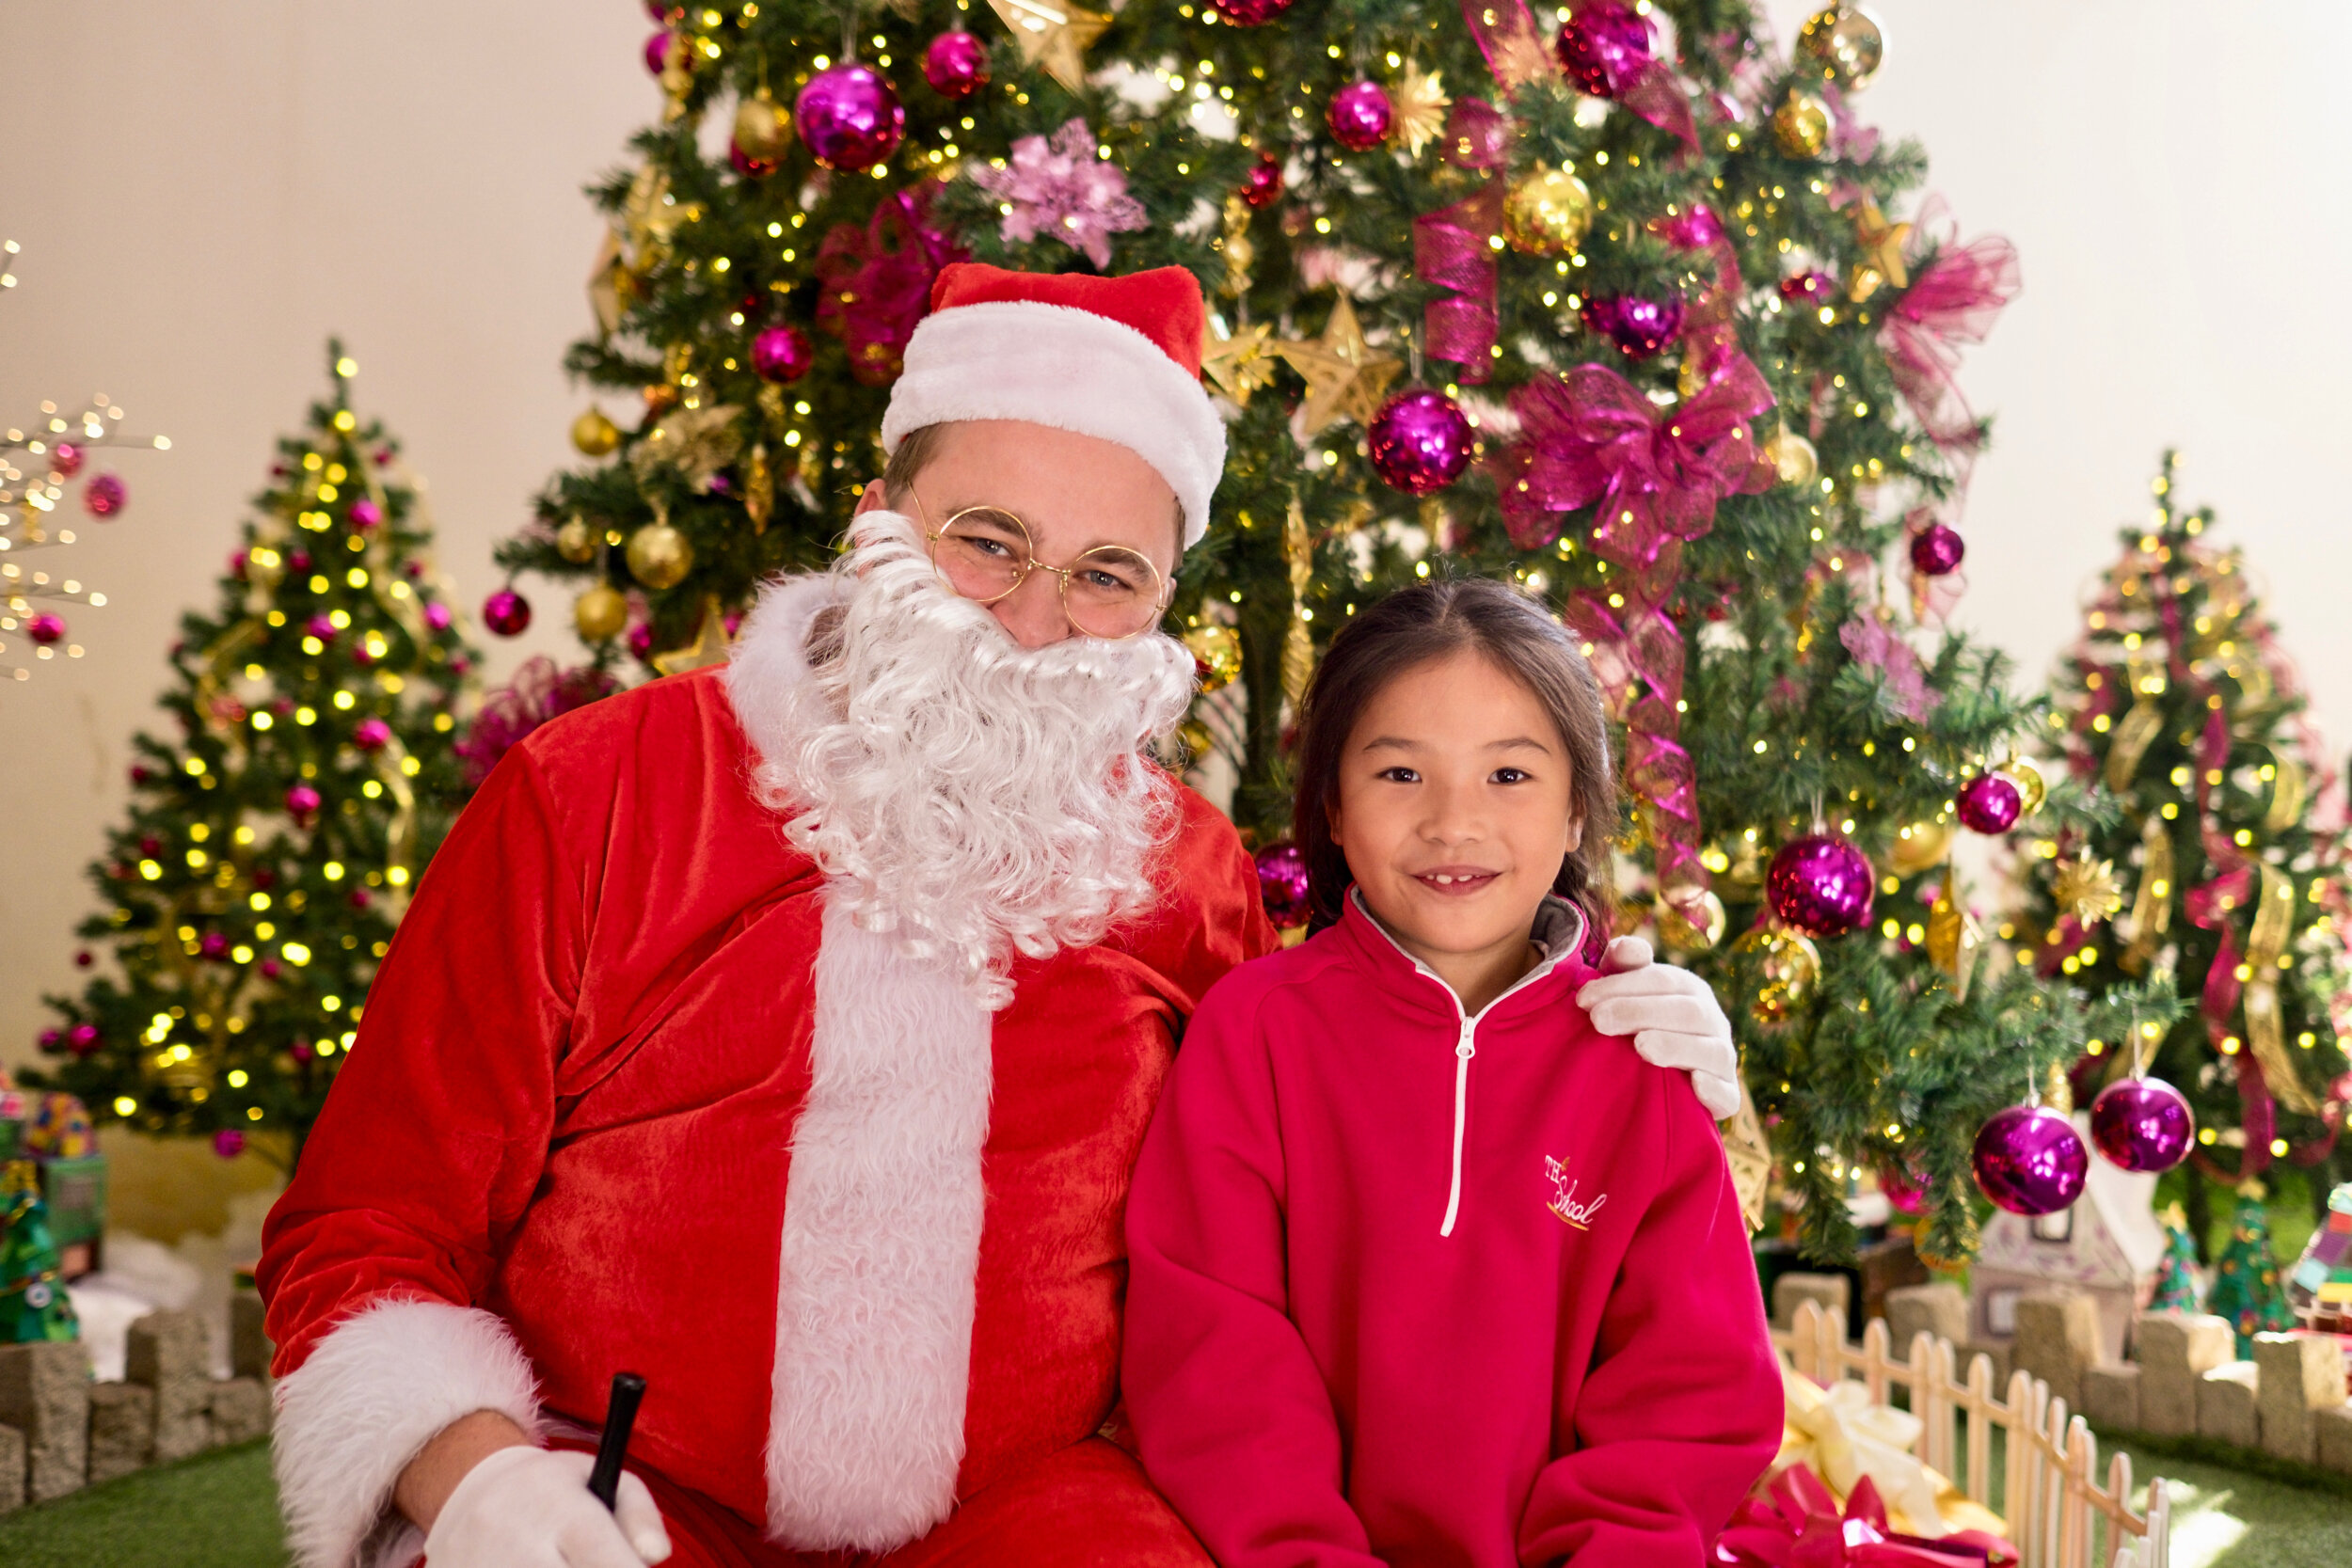 Photoshoot with Santa Clause-522.jpg